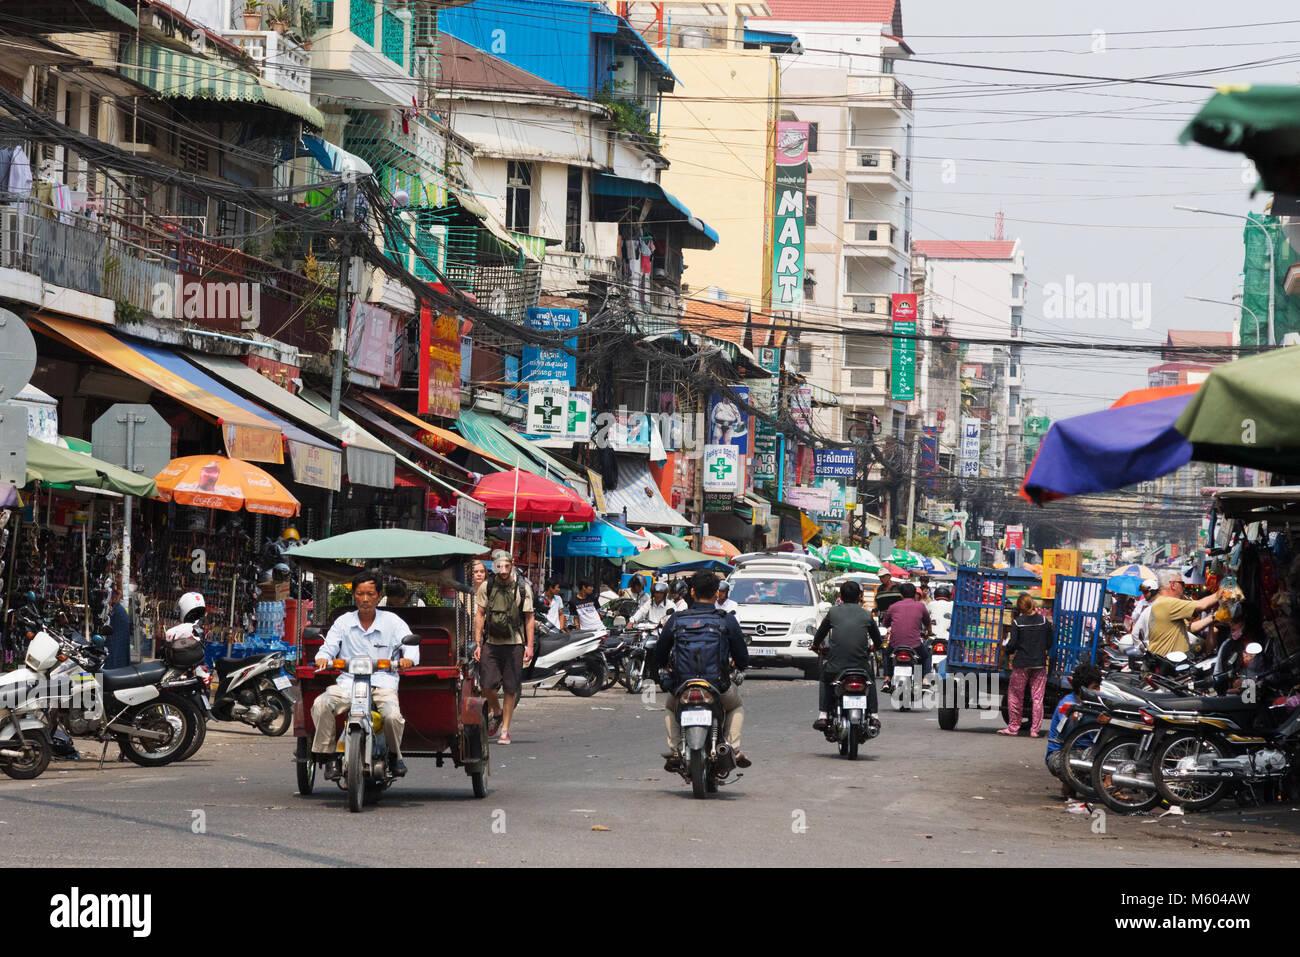 Phnom Penh Cambodia - Busy street view, with motorcycles, Phnom Penh, Cambodia Asia - Stock Image